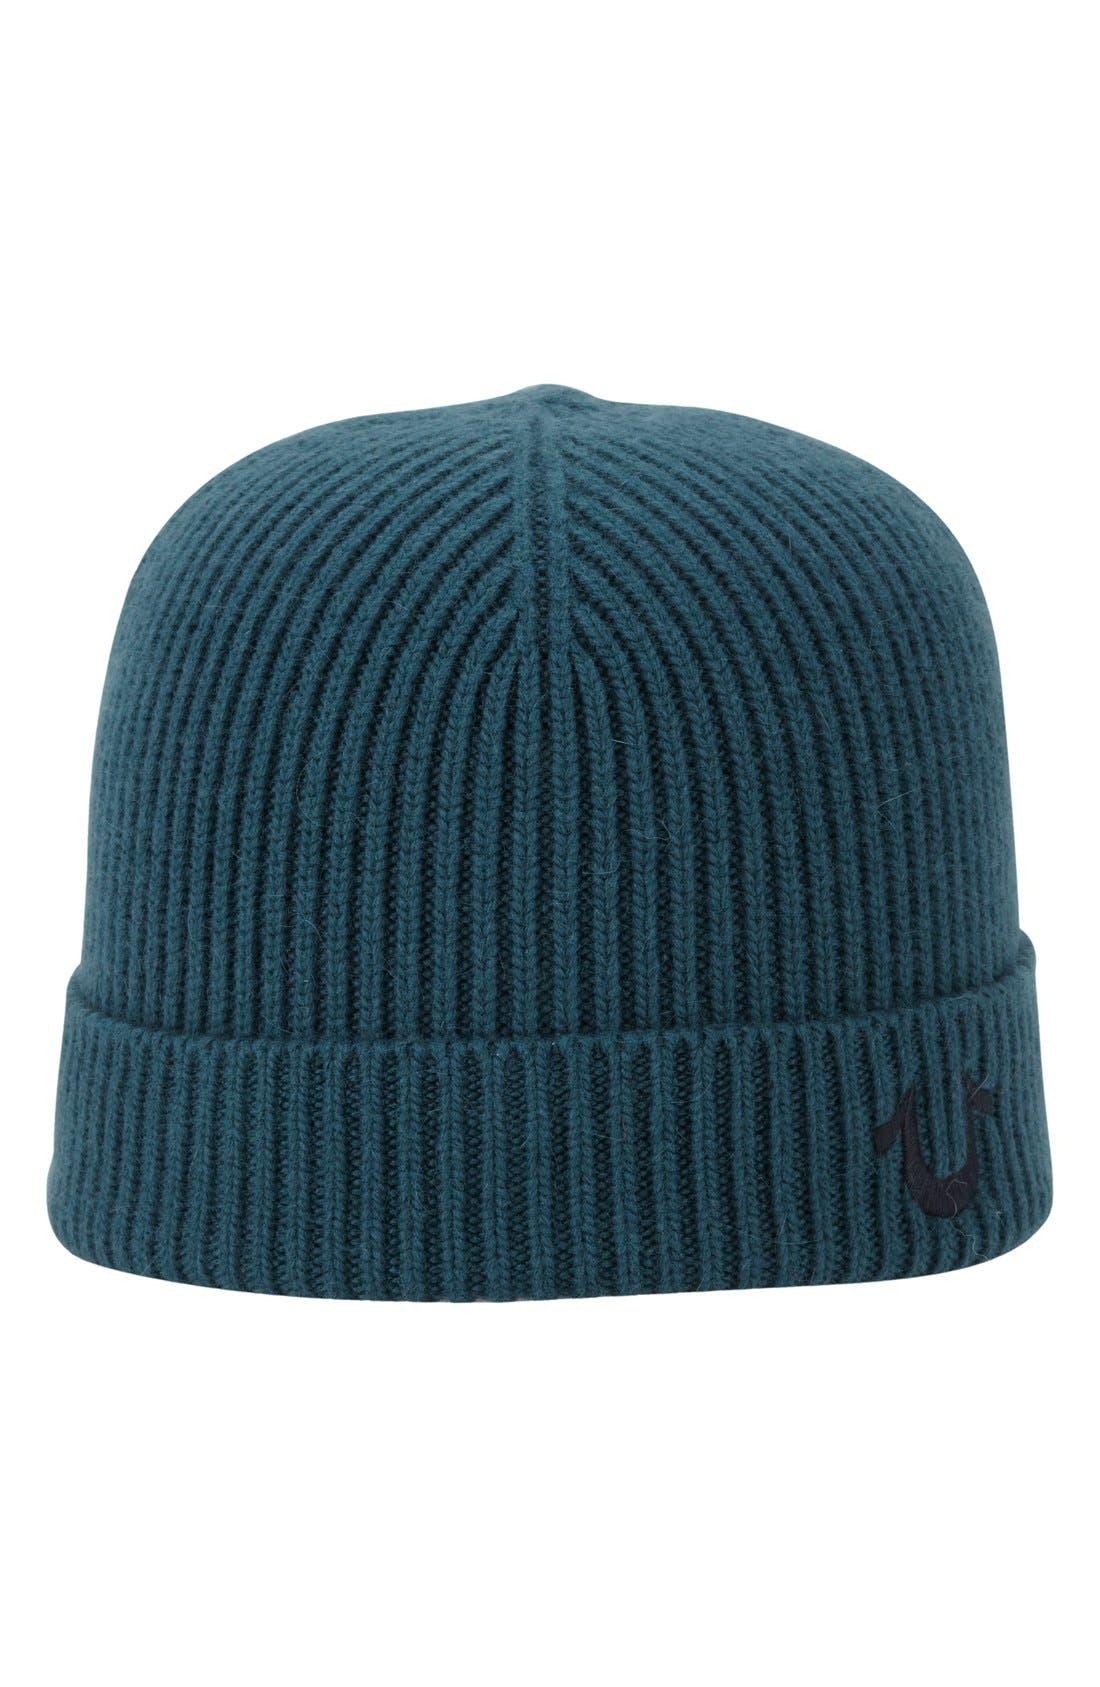 Alternate Image 1 Selected - True Religion Brand Jeans Rib Knit Cap